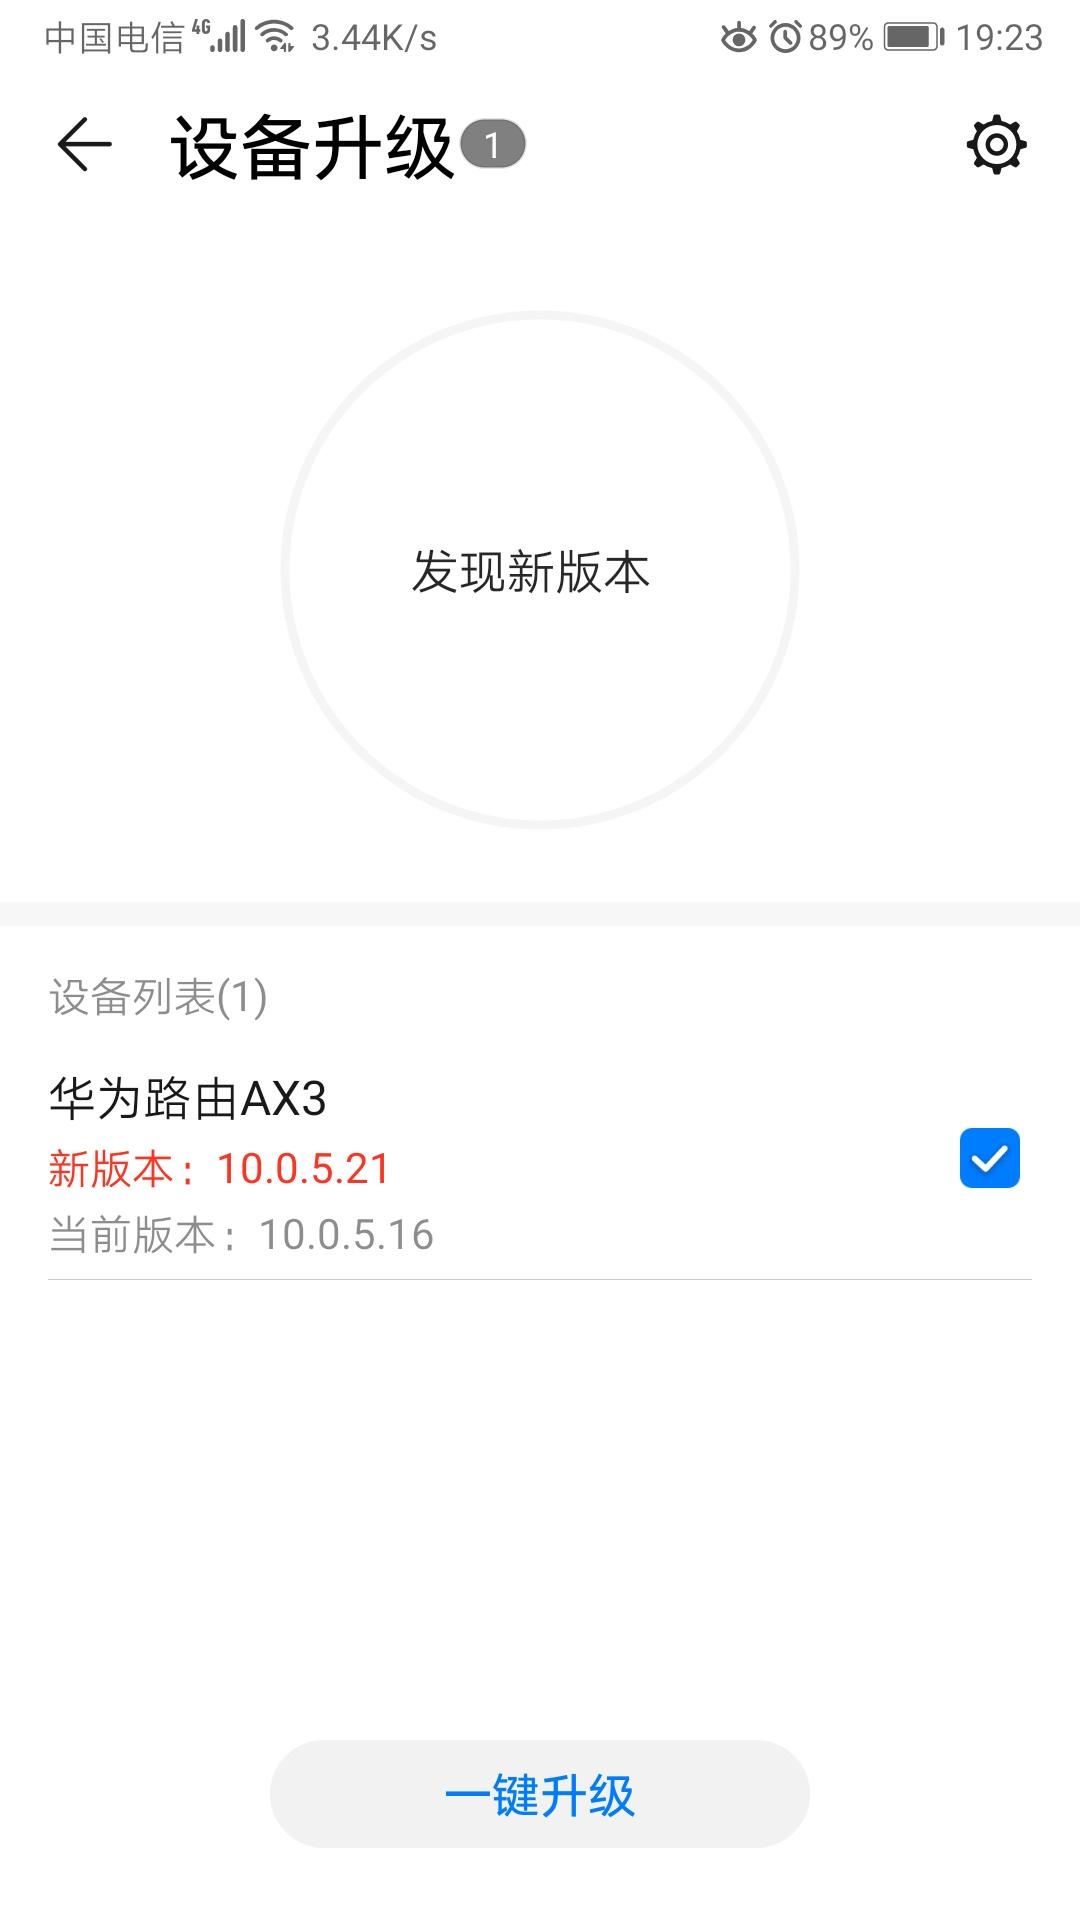 Screenshot_20200508_192339_com.huawei.smarthome.jpg